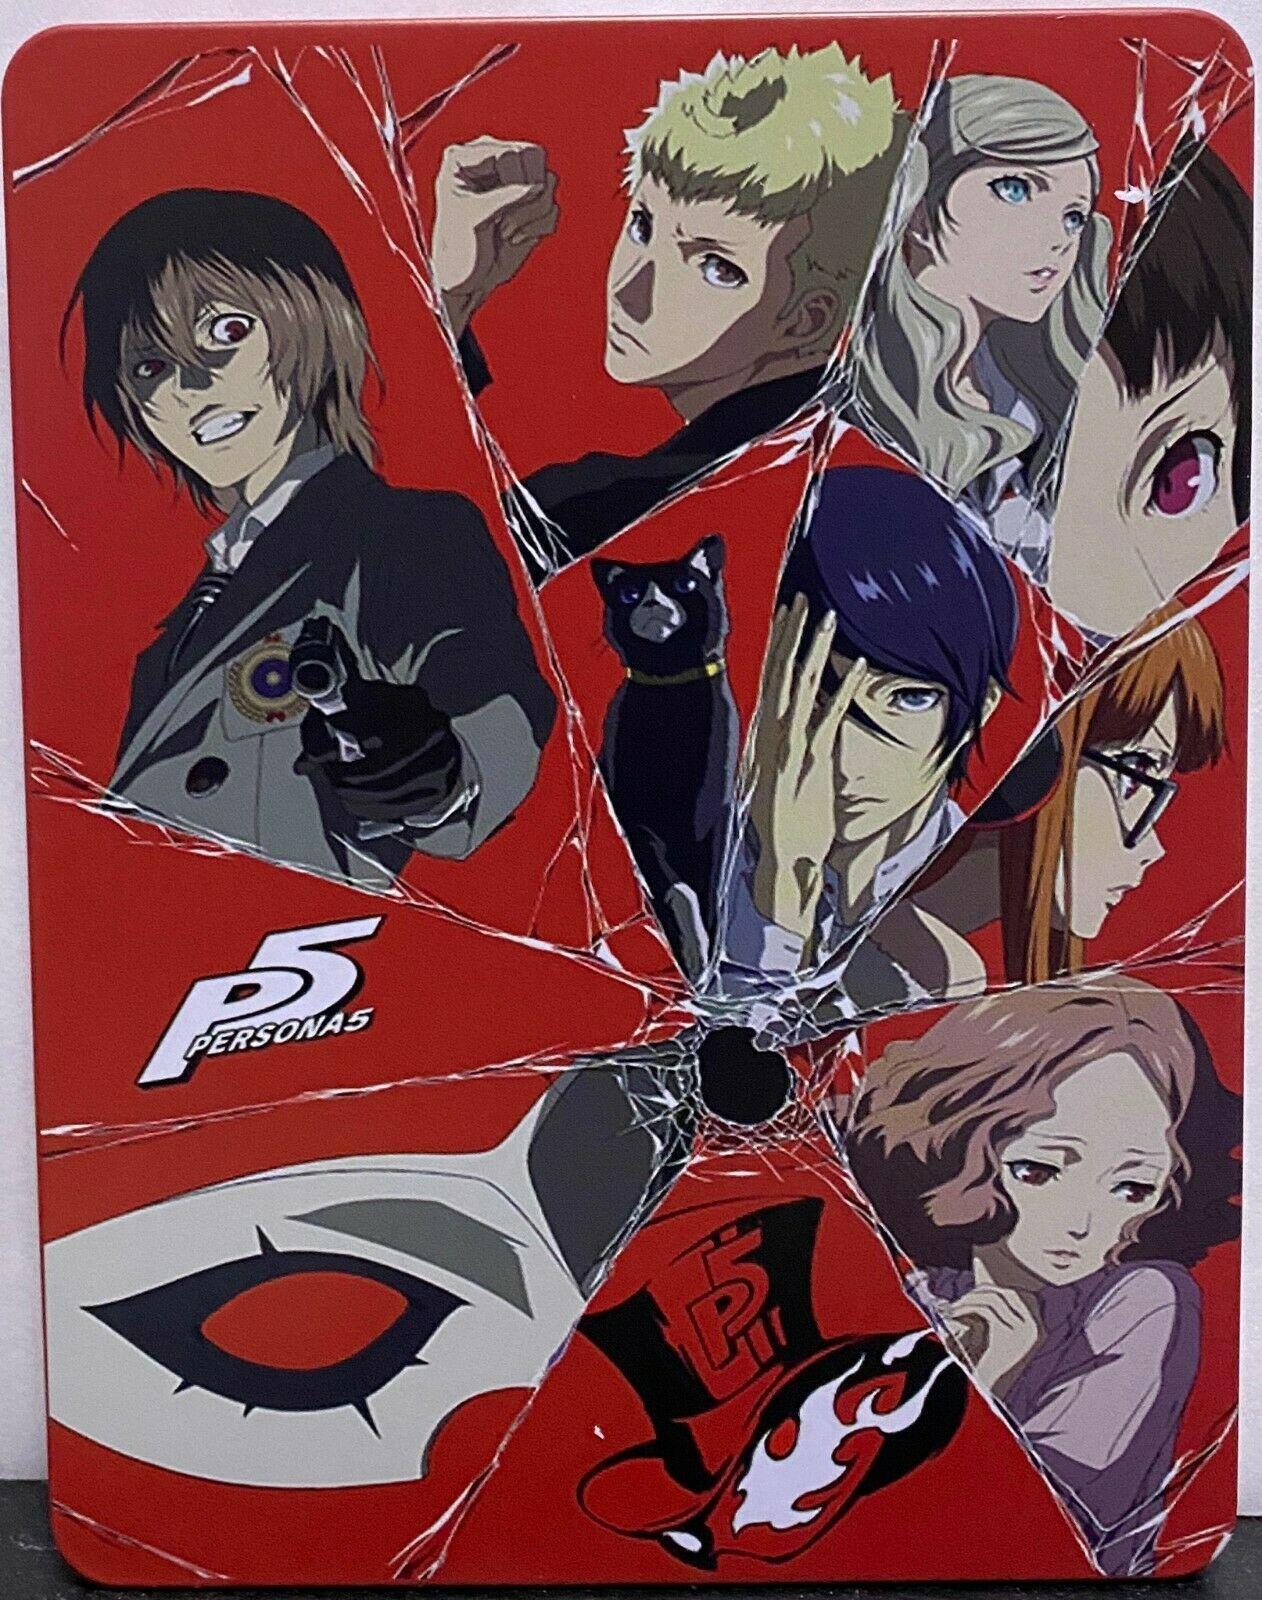 Persona 5 Custome Steelbook Case PS4 (NO GAME DISK